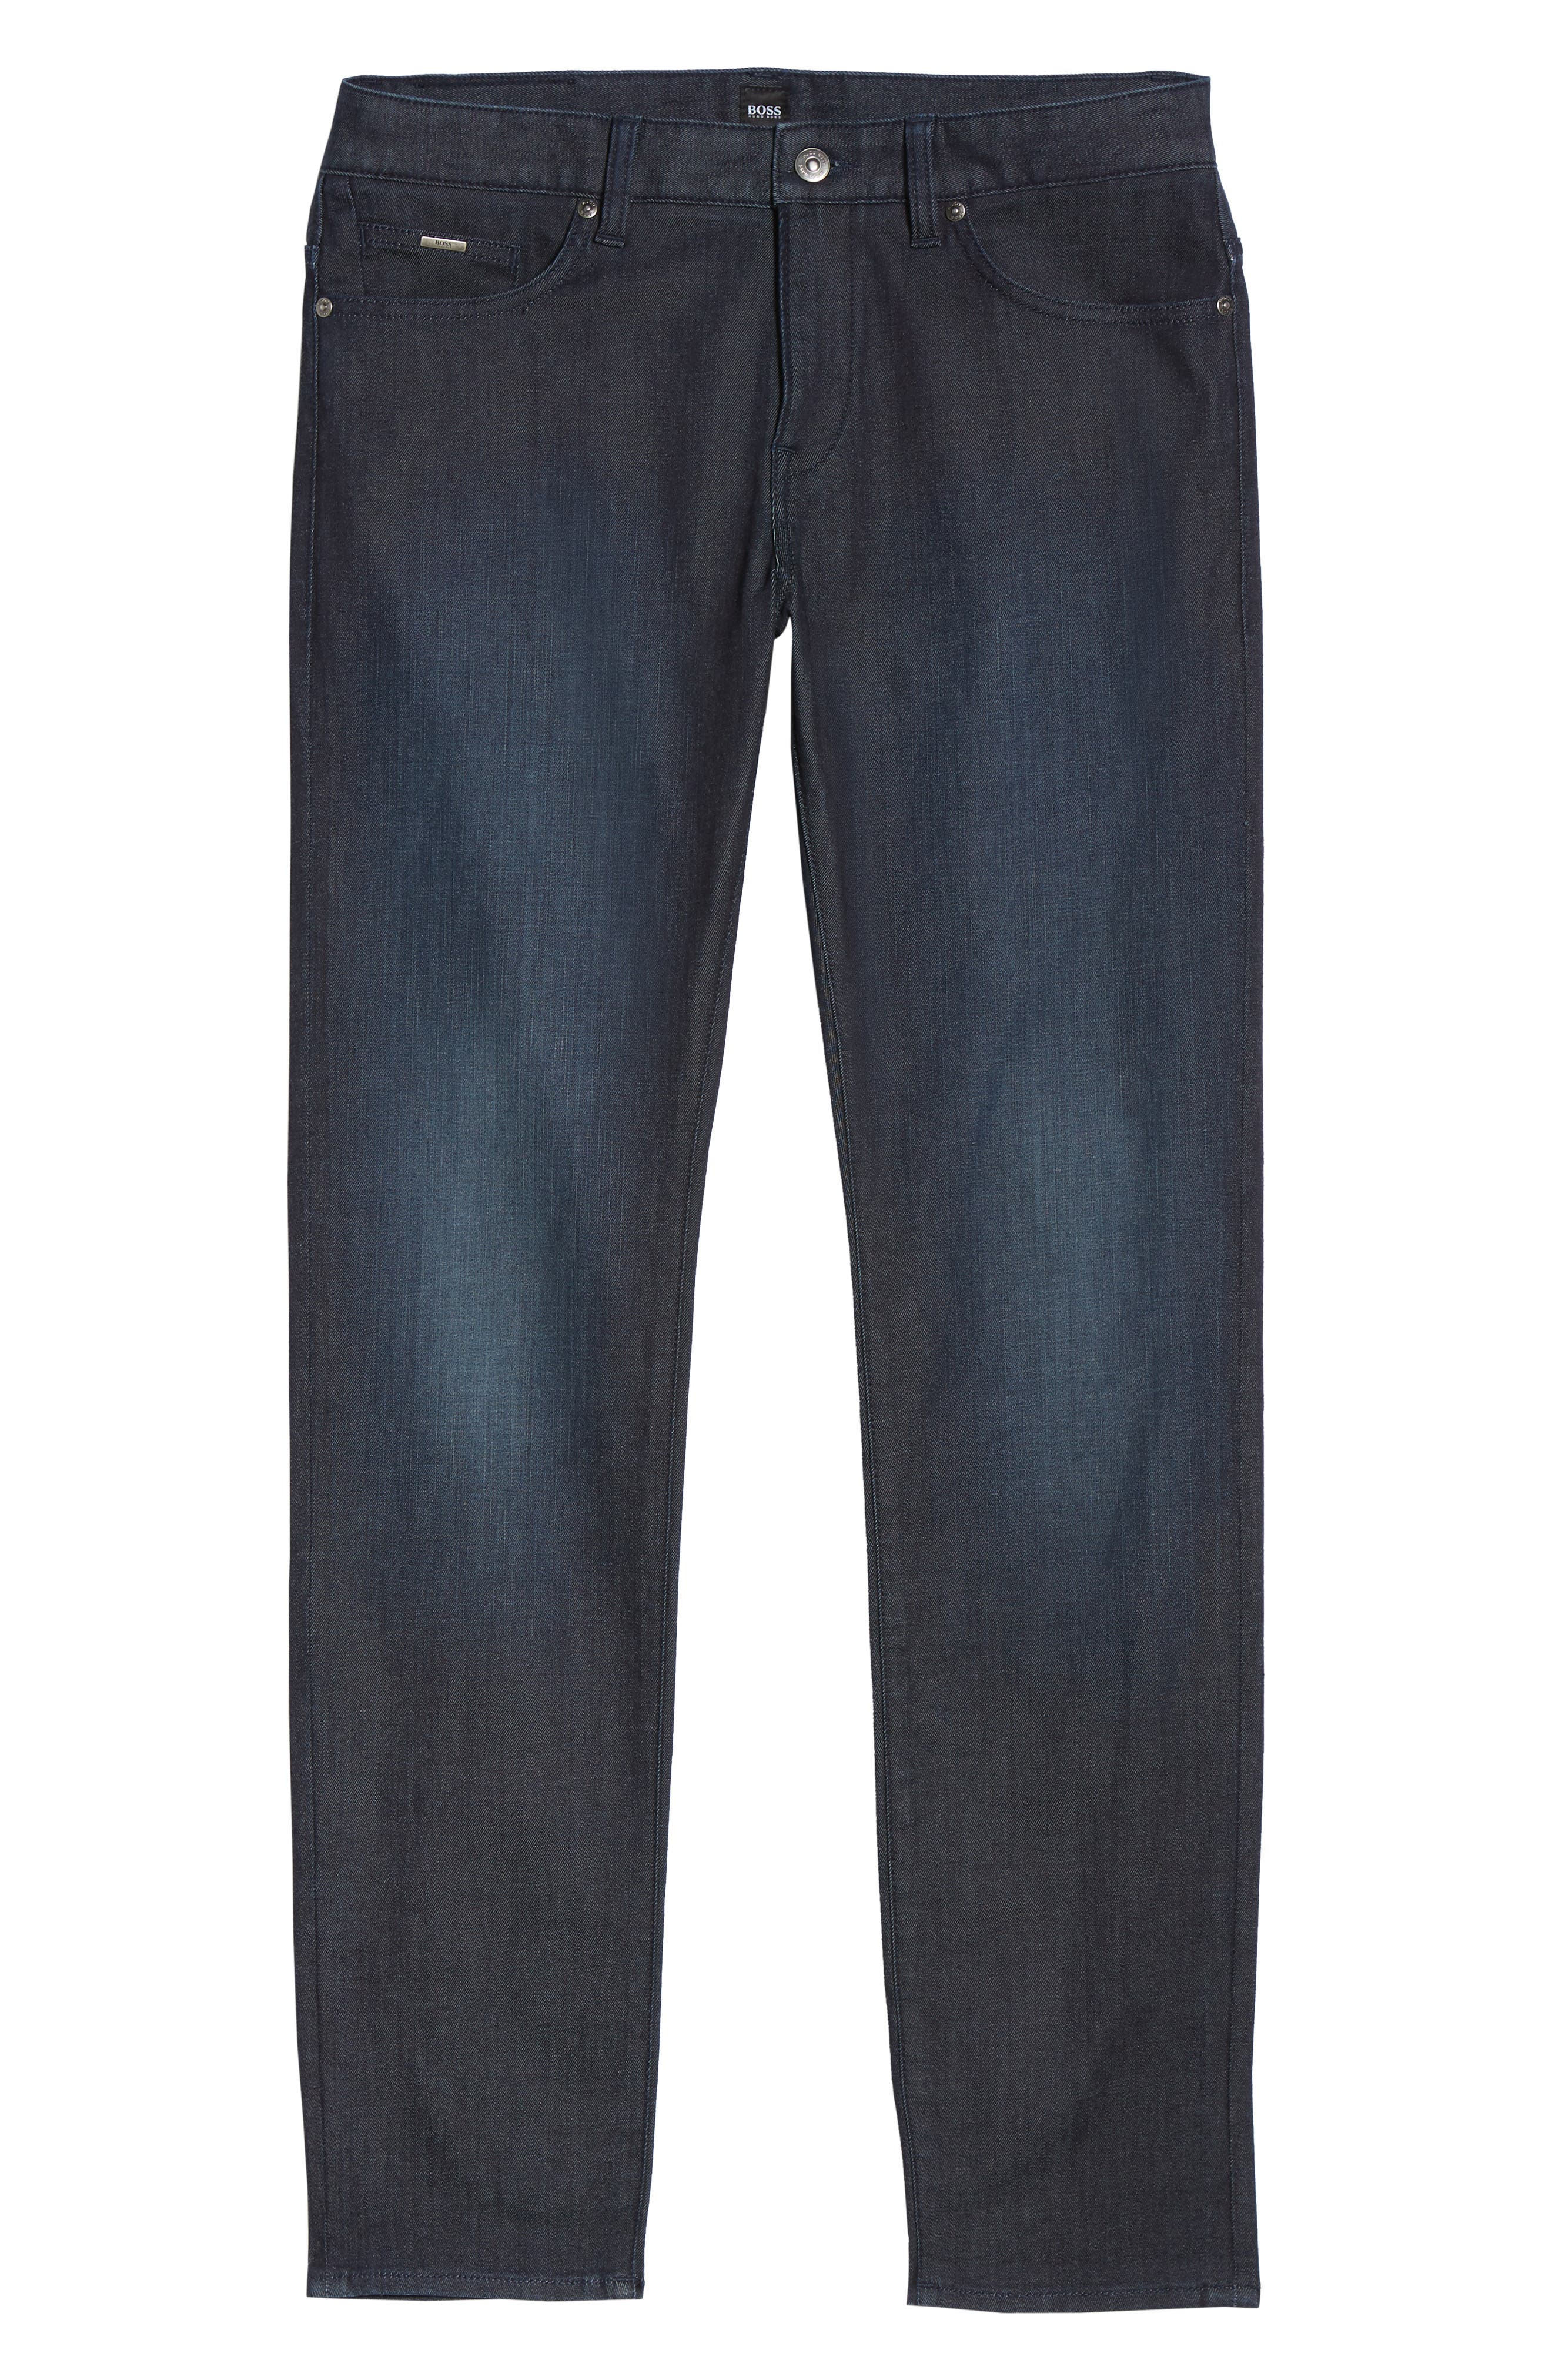 Delaware Slim Fit Jeans,                             Alternate thumbnail 6, color,                             Blue